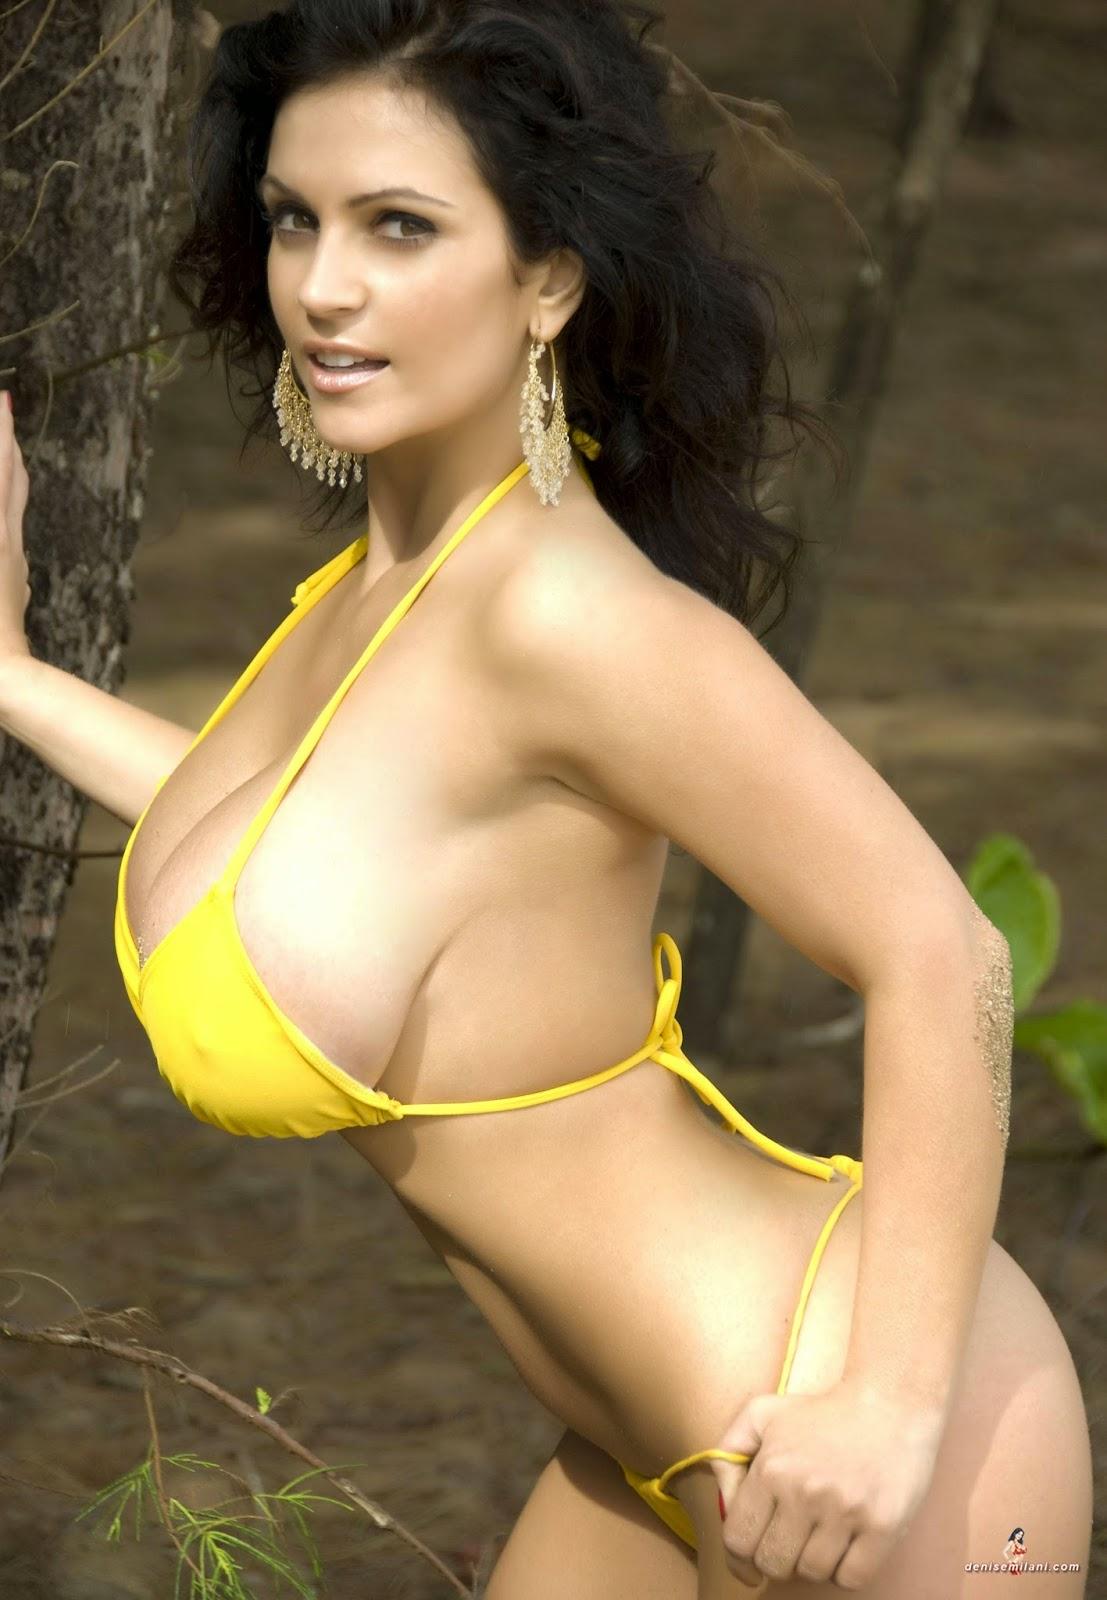 Denise Milani Archives Yellow Bikini Mini Bikini-8977